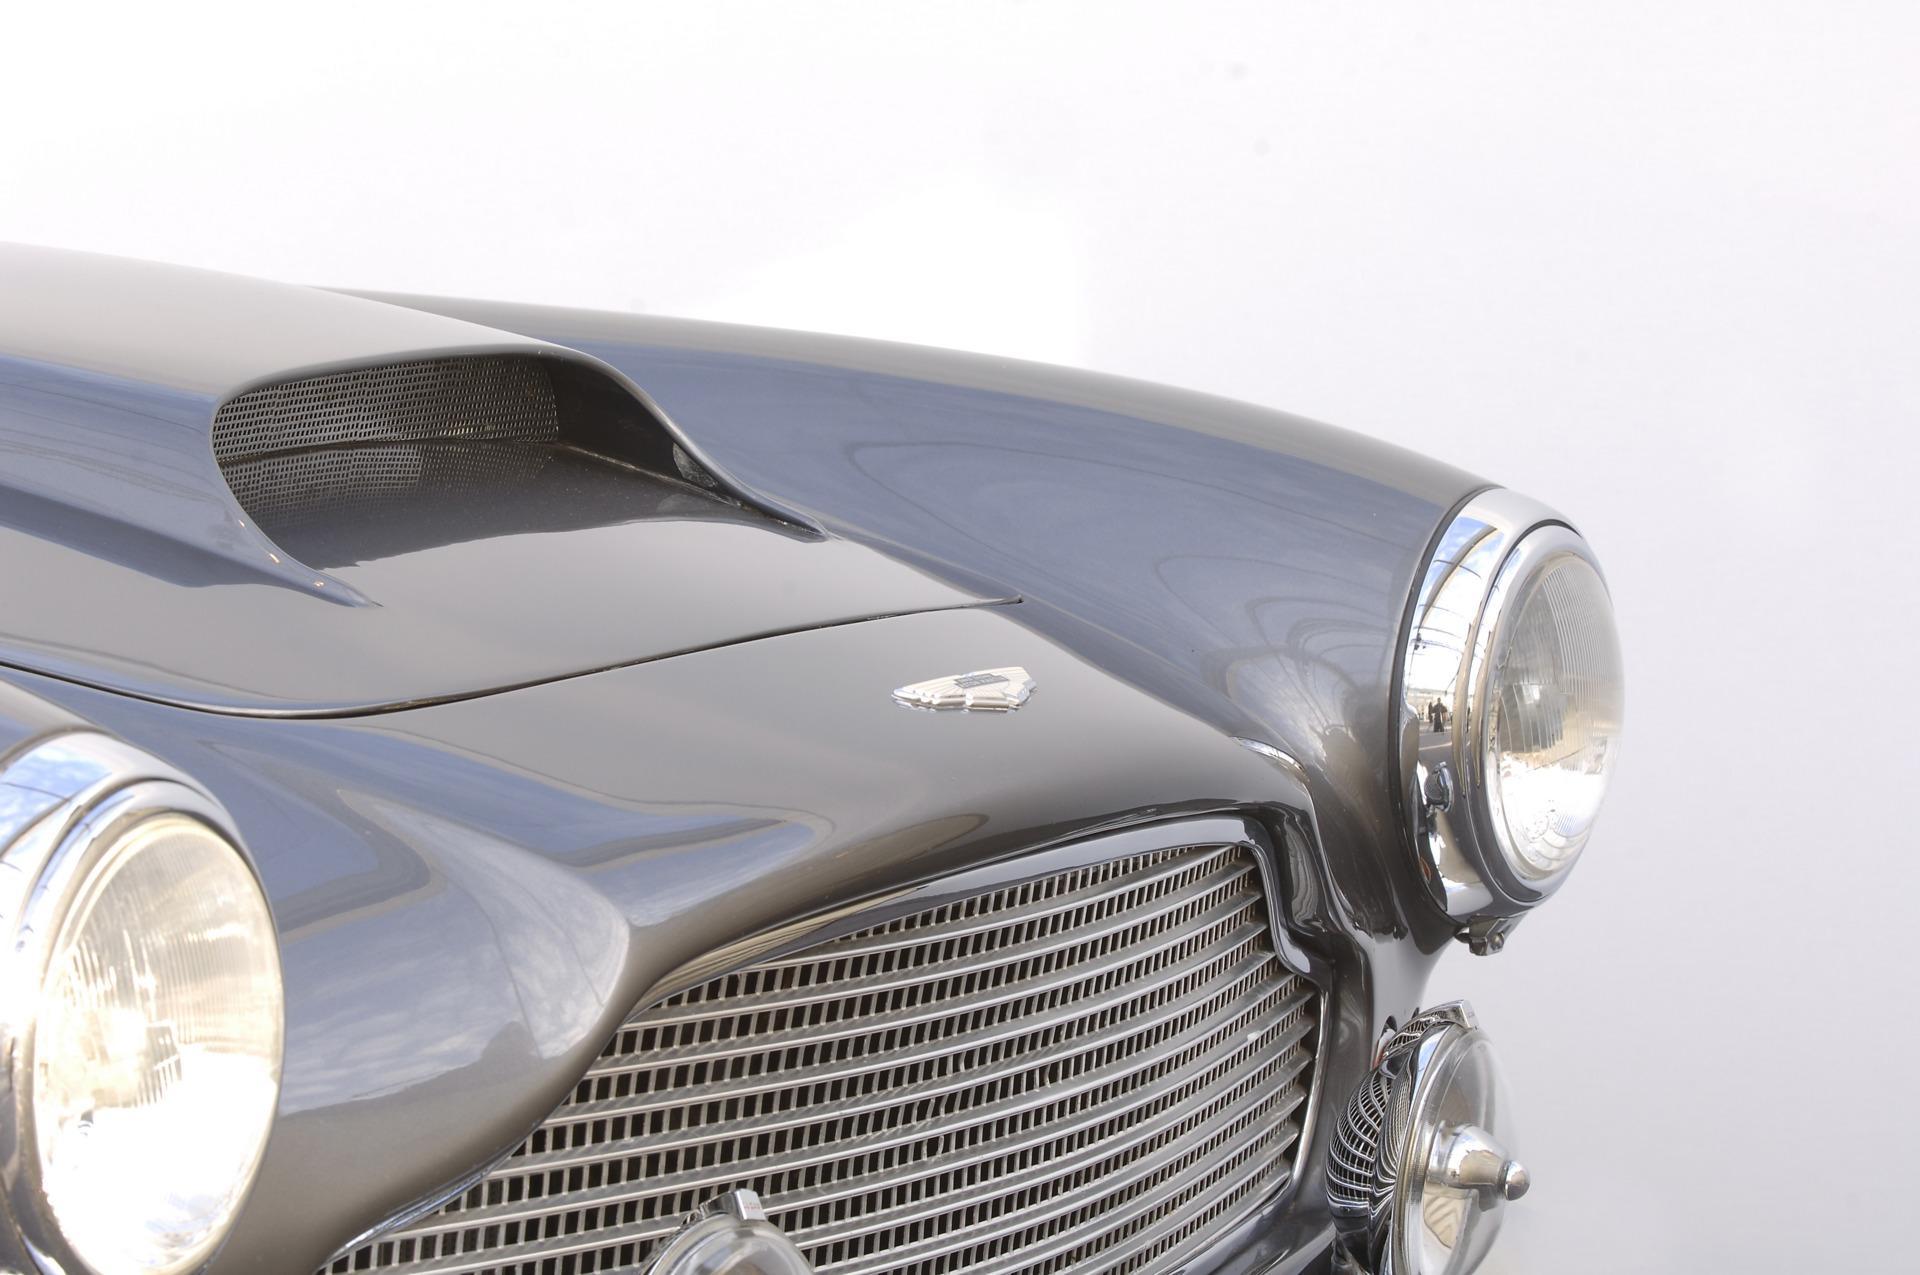 1958 Aston Martin Db4 Wallpapers Hd Drivespark